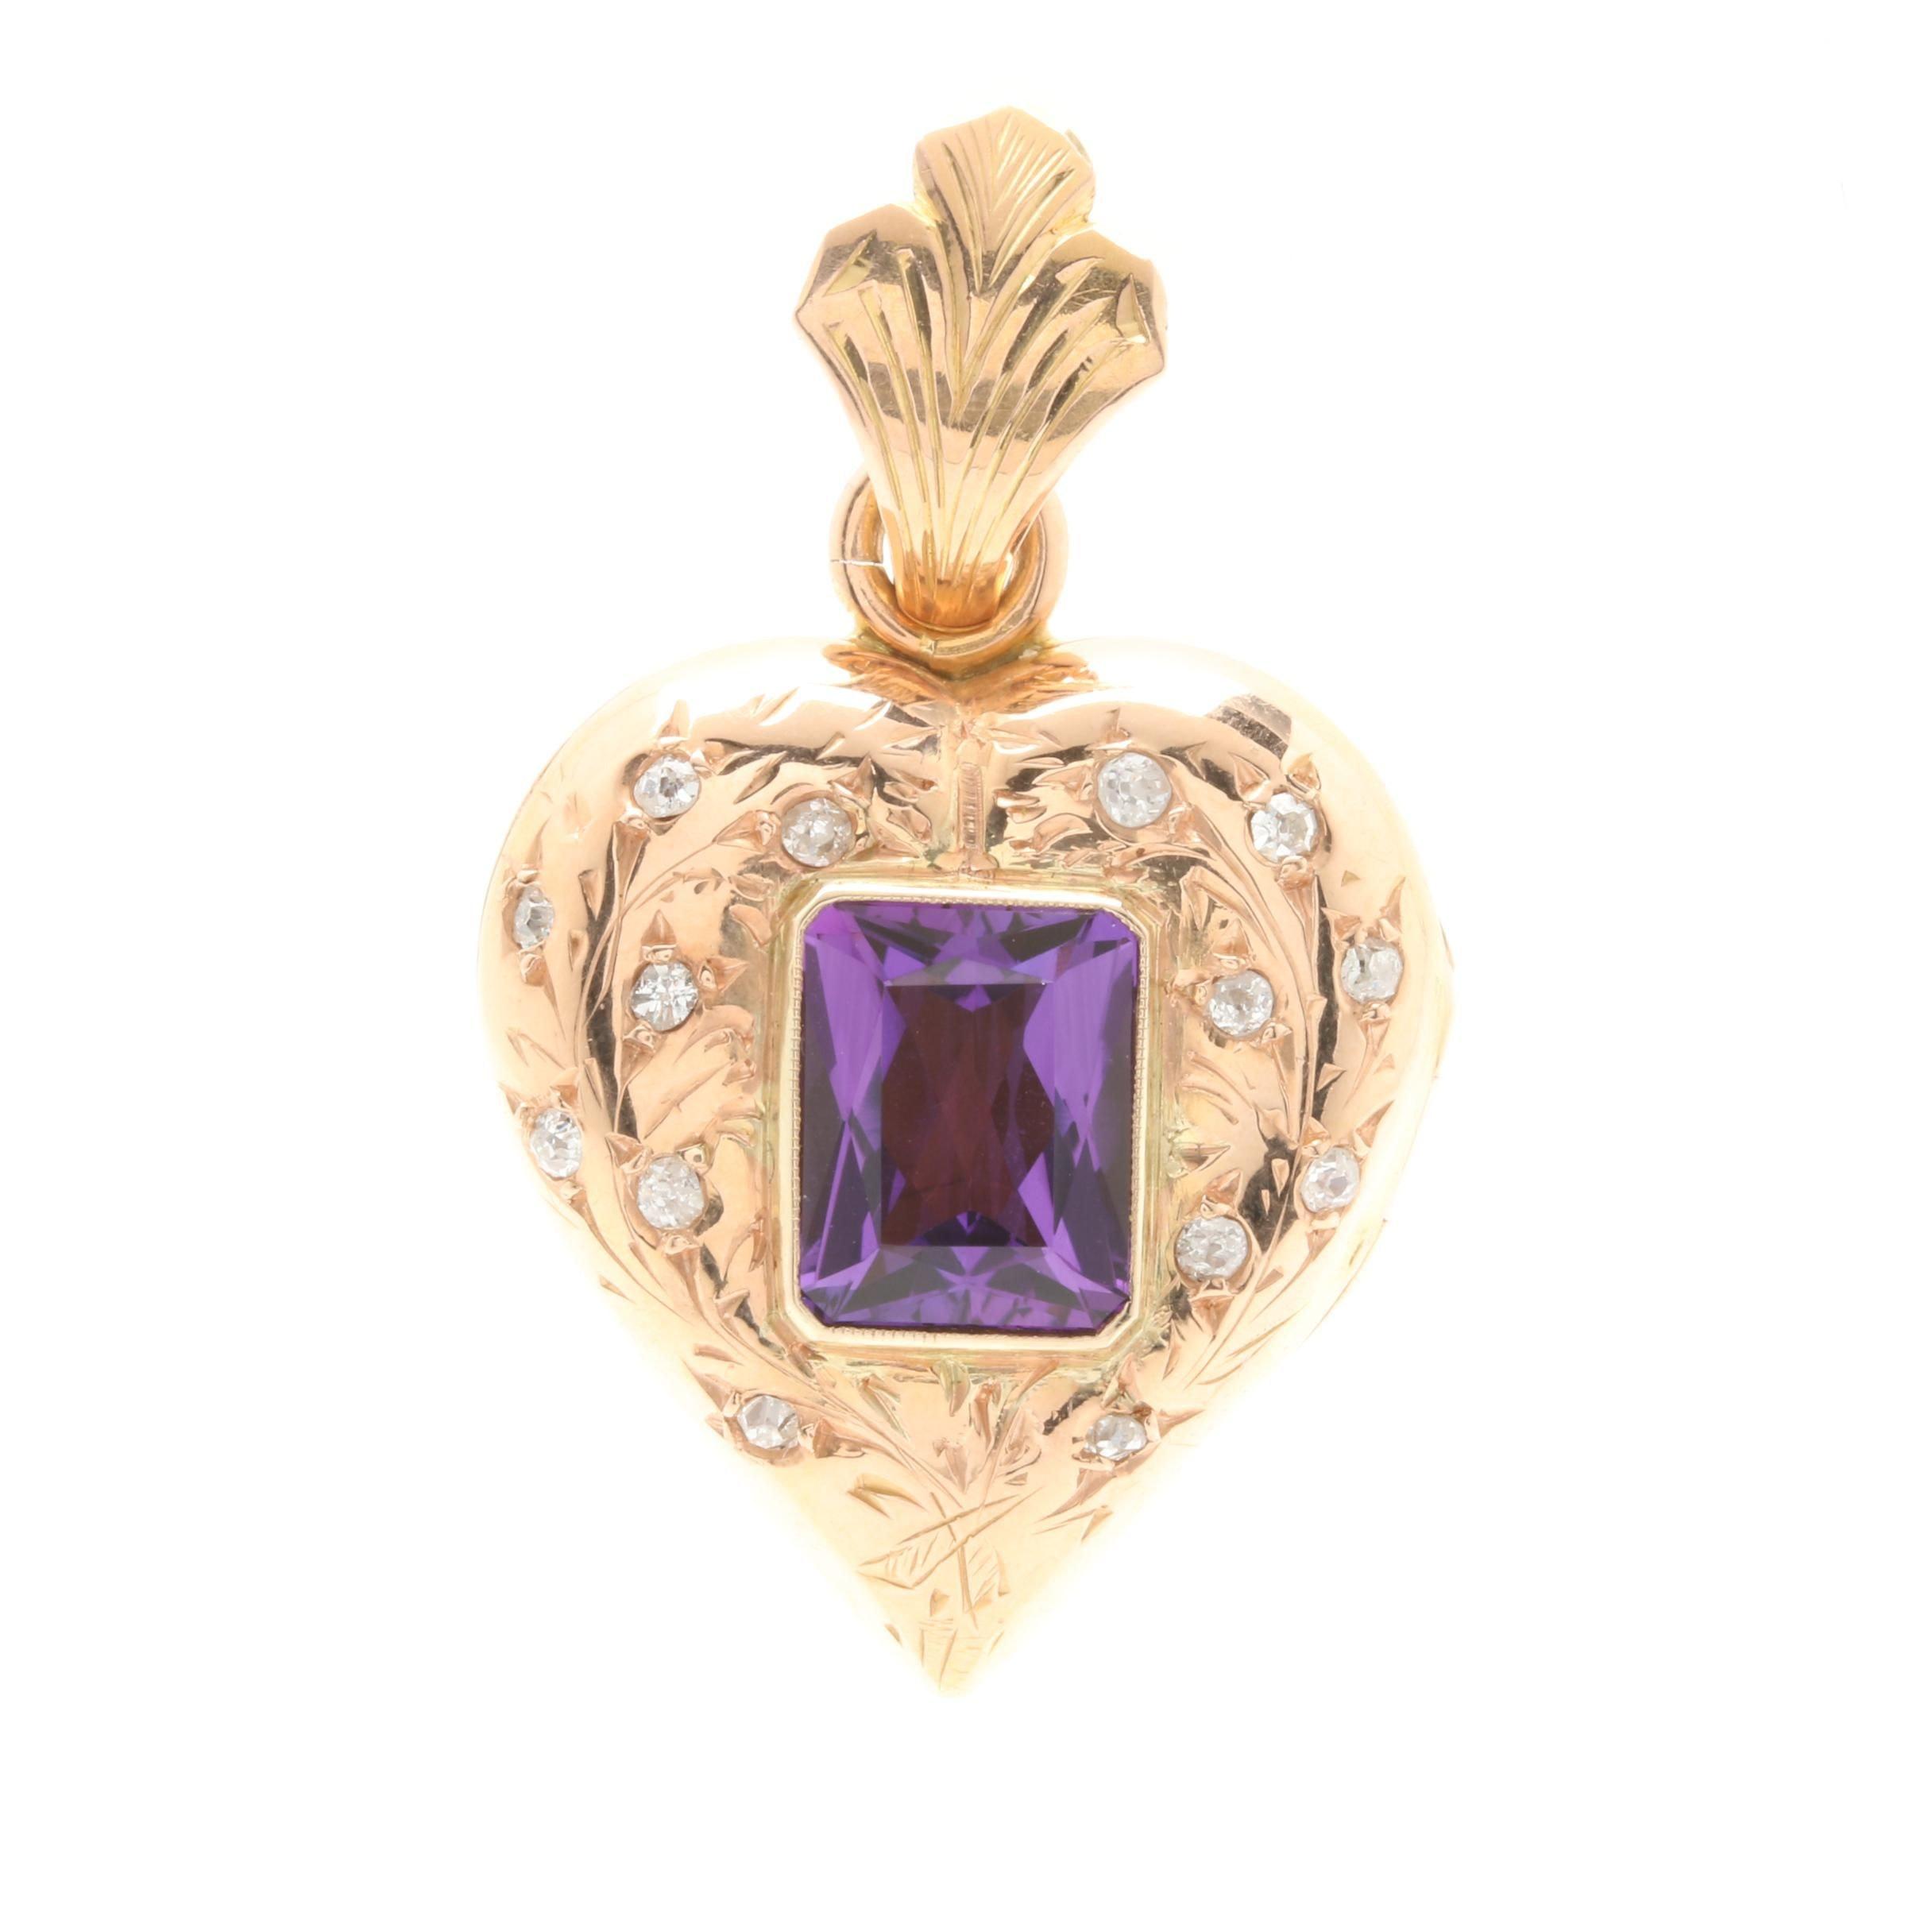 Victorian 18K Yellow Gold Amethyst and Diamond Heart Locket Pendant